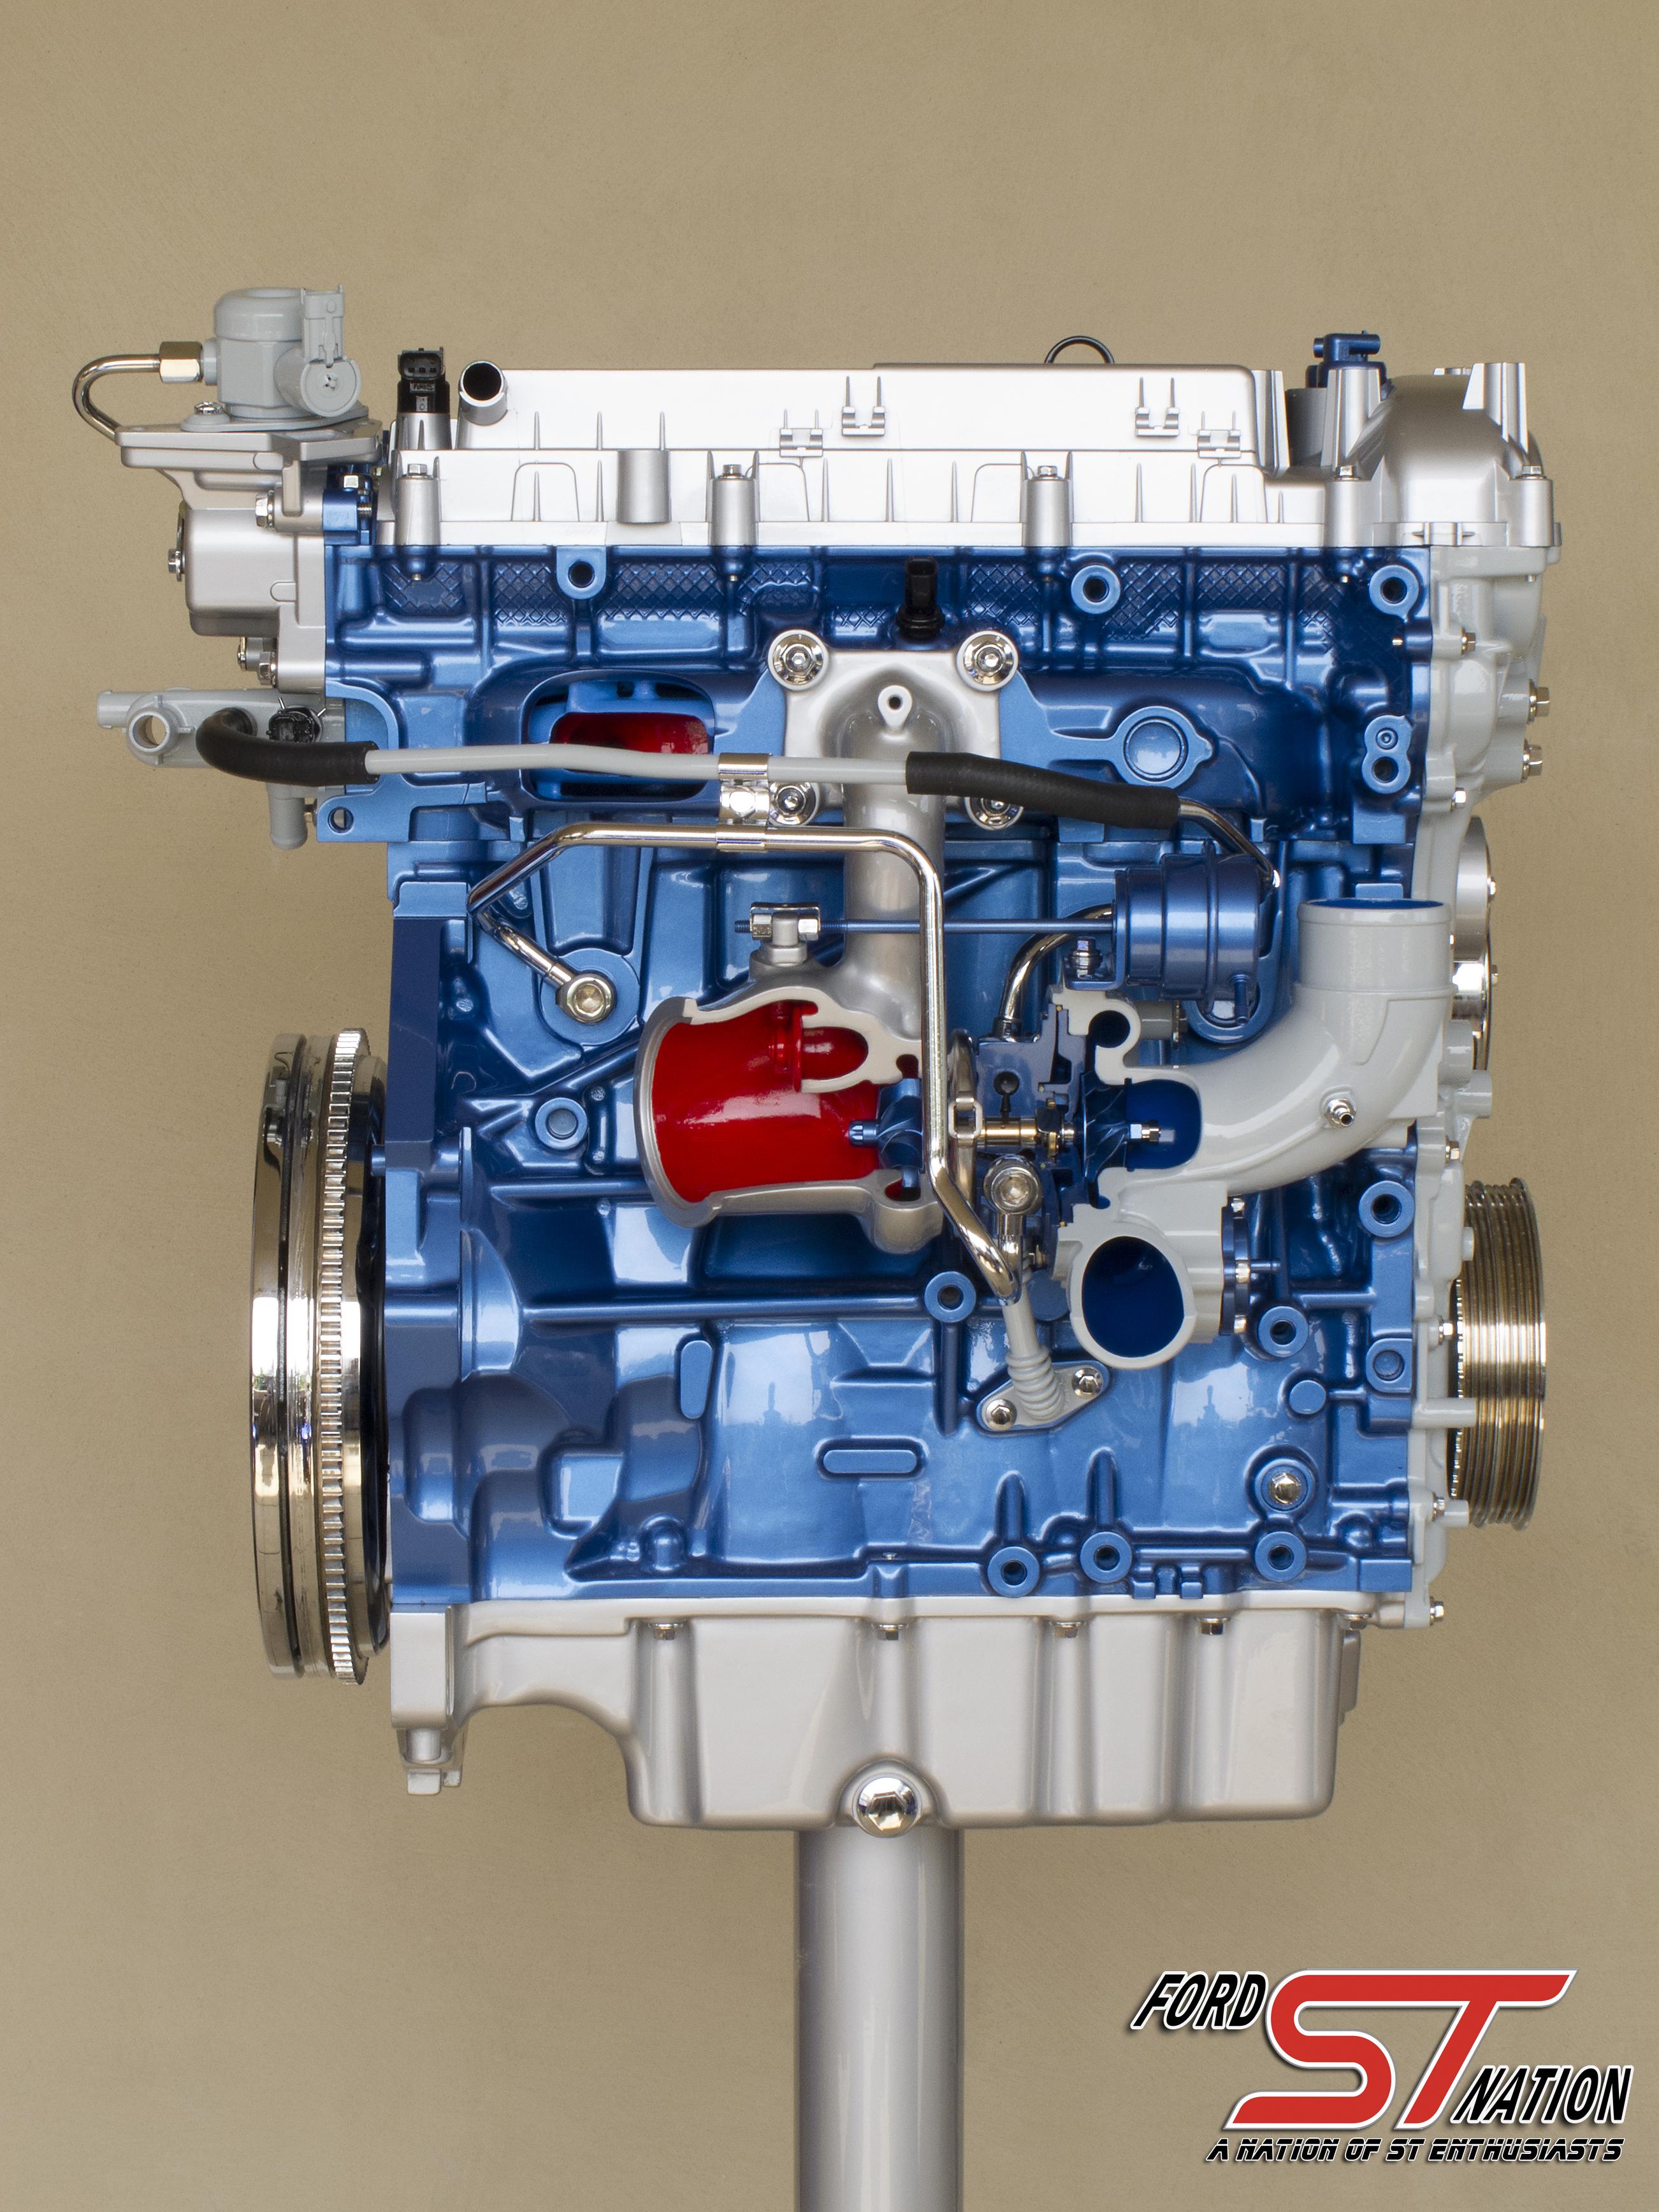 Ford focus st ecoboost engine 11